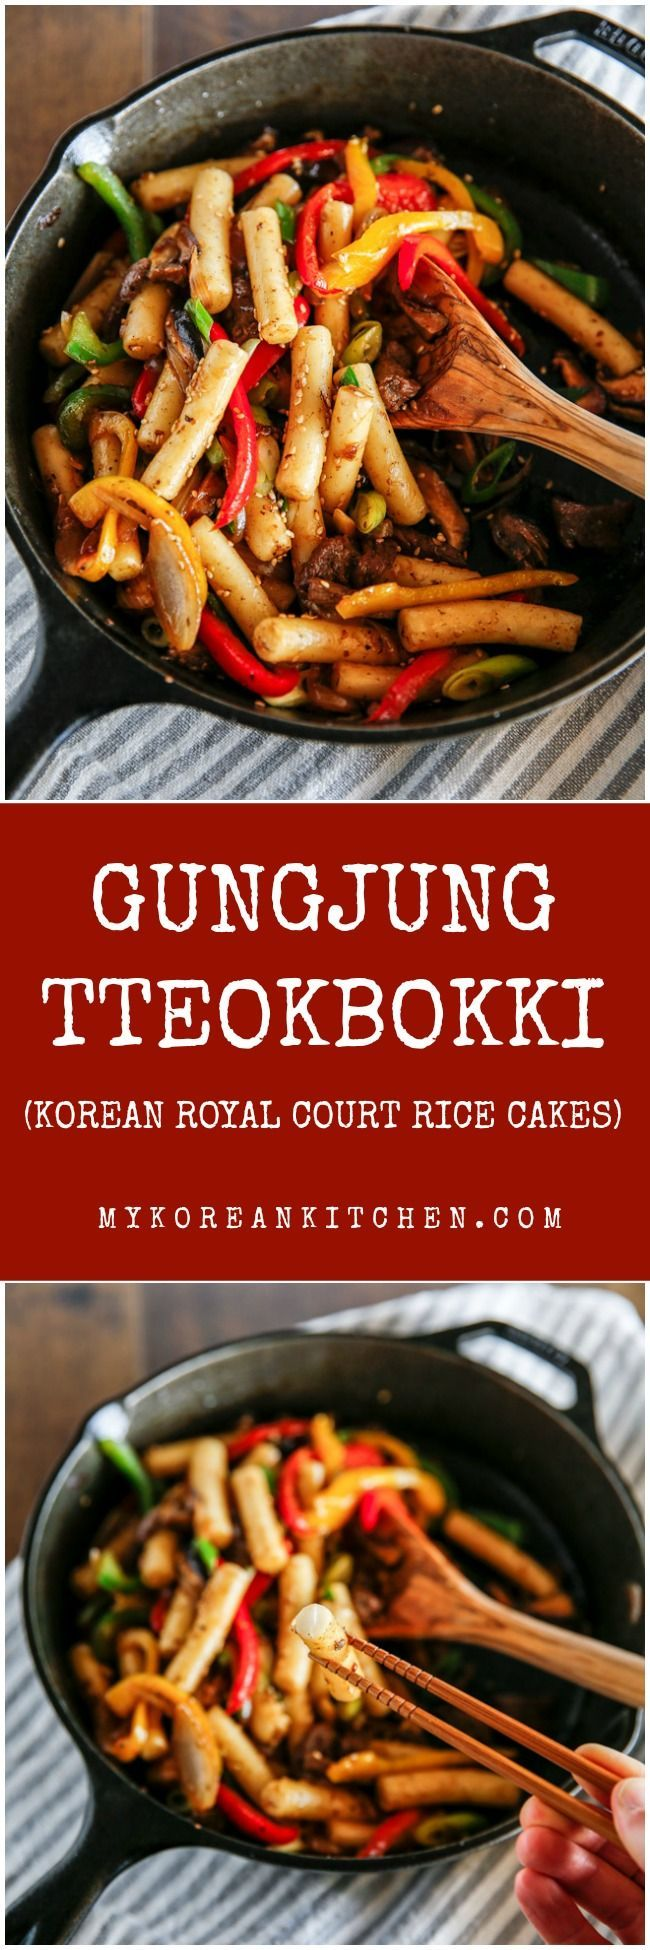 Blue apron korean rice cakes - Gungjung Tteokbokki Korean Royal Court Rice Cakes Mykoreankitchen Com